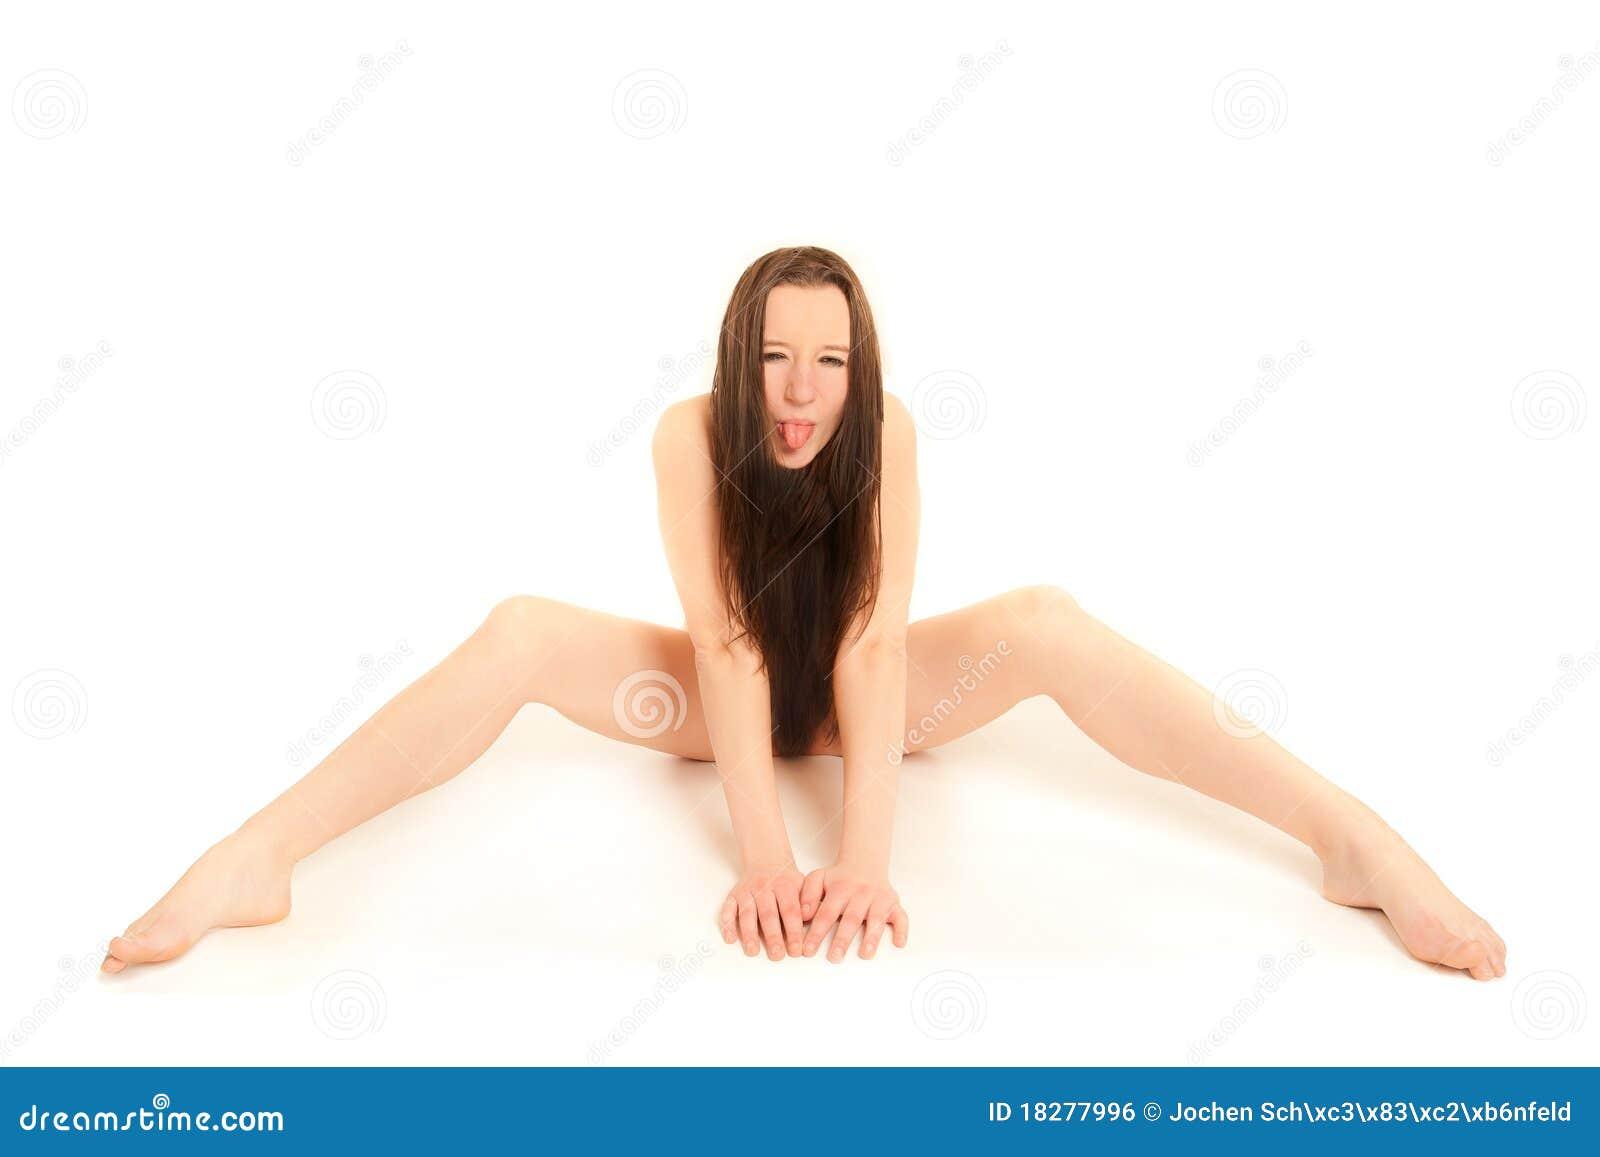 Nude Europeans